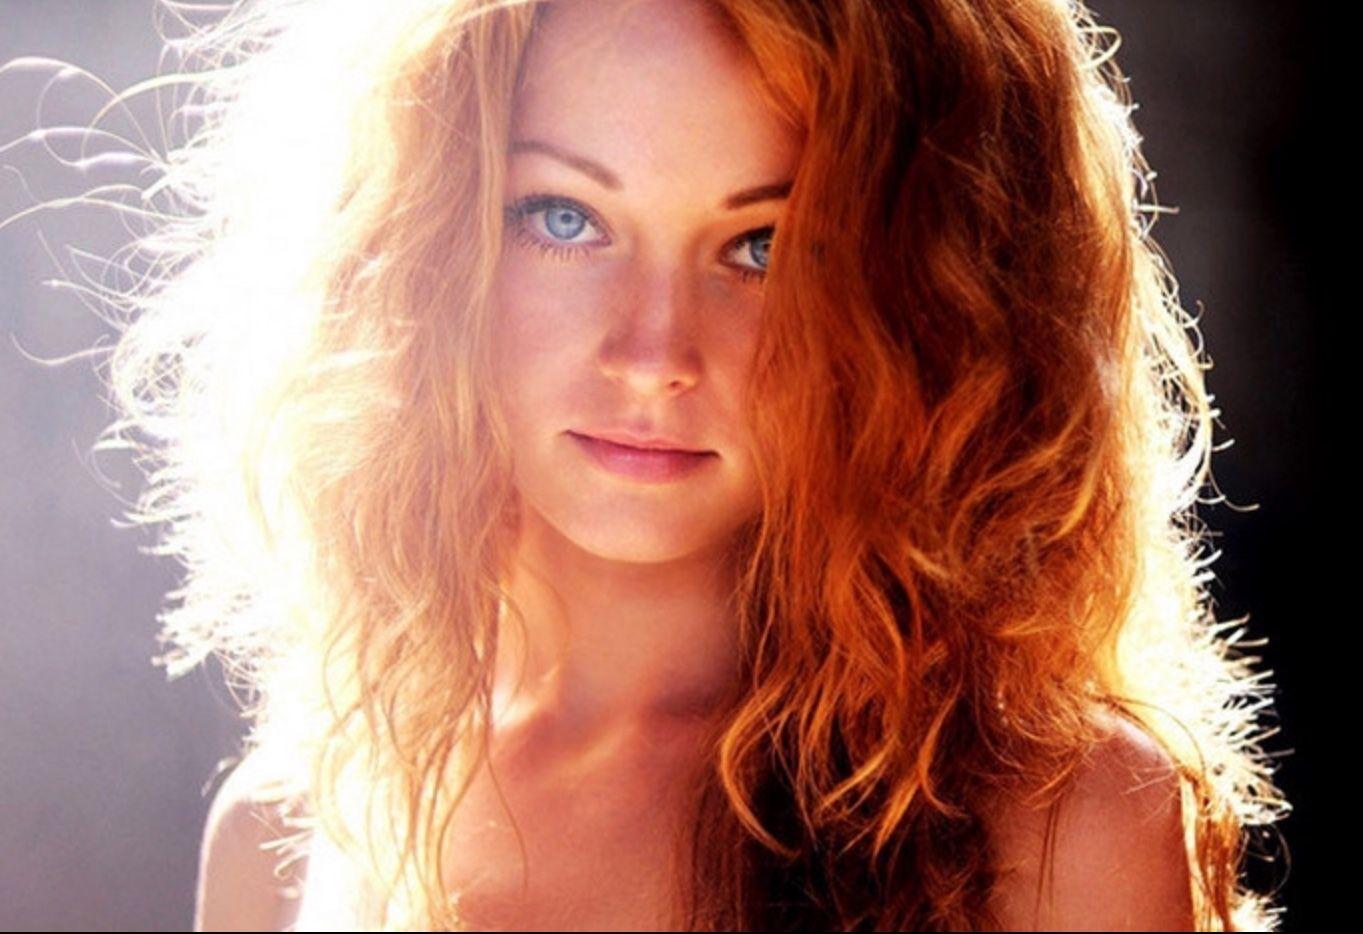 Pin Von Karl Uppenkamp Auf Tolle Frauen Rote Haare Blaue Augen Frisuren Langhaar Schone Rote Haare